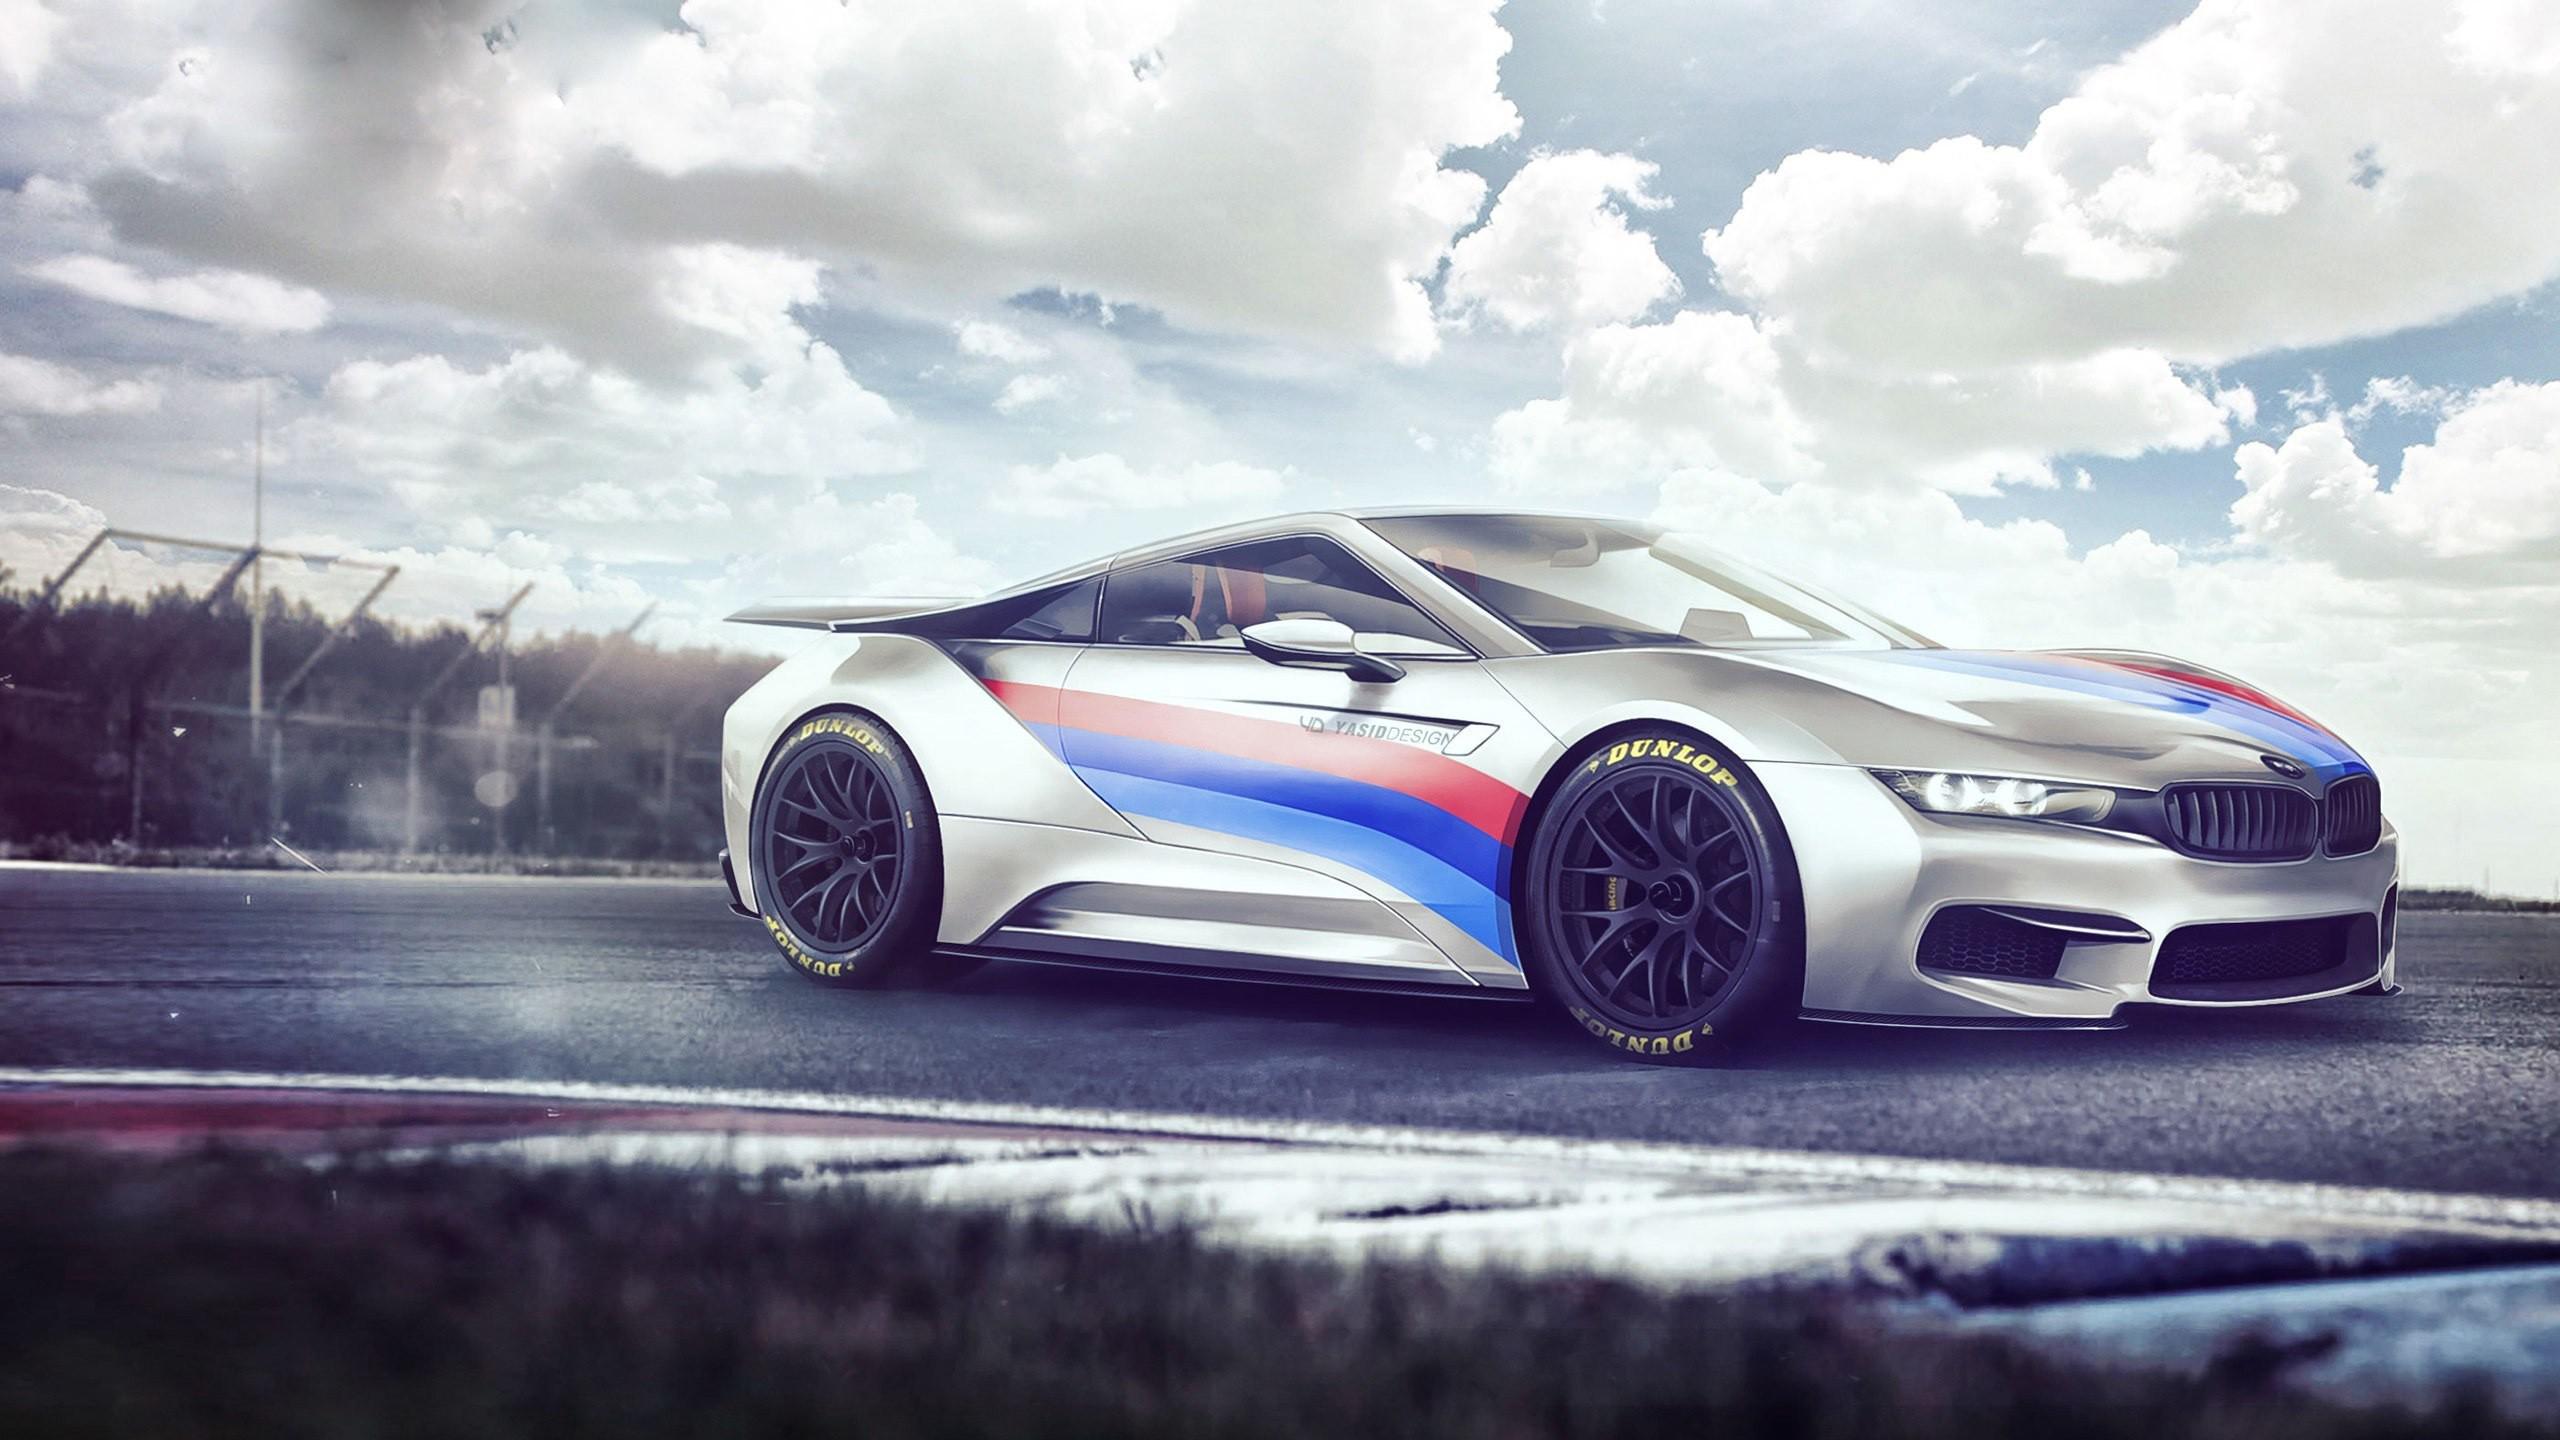 BMW I8 Concept Electro Wallpaper HD Car Wallpapers ID